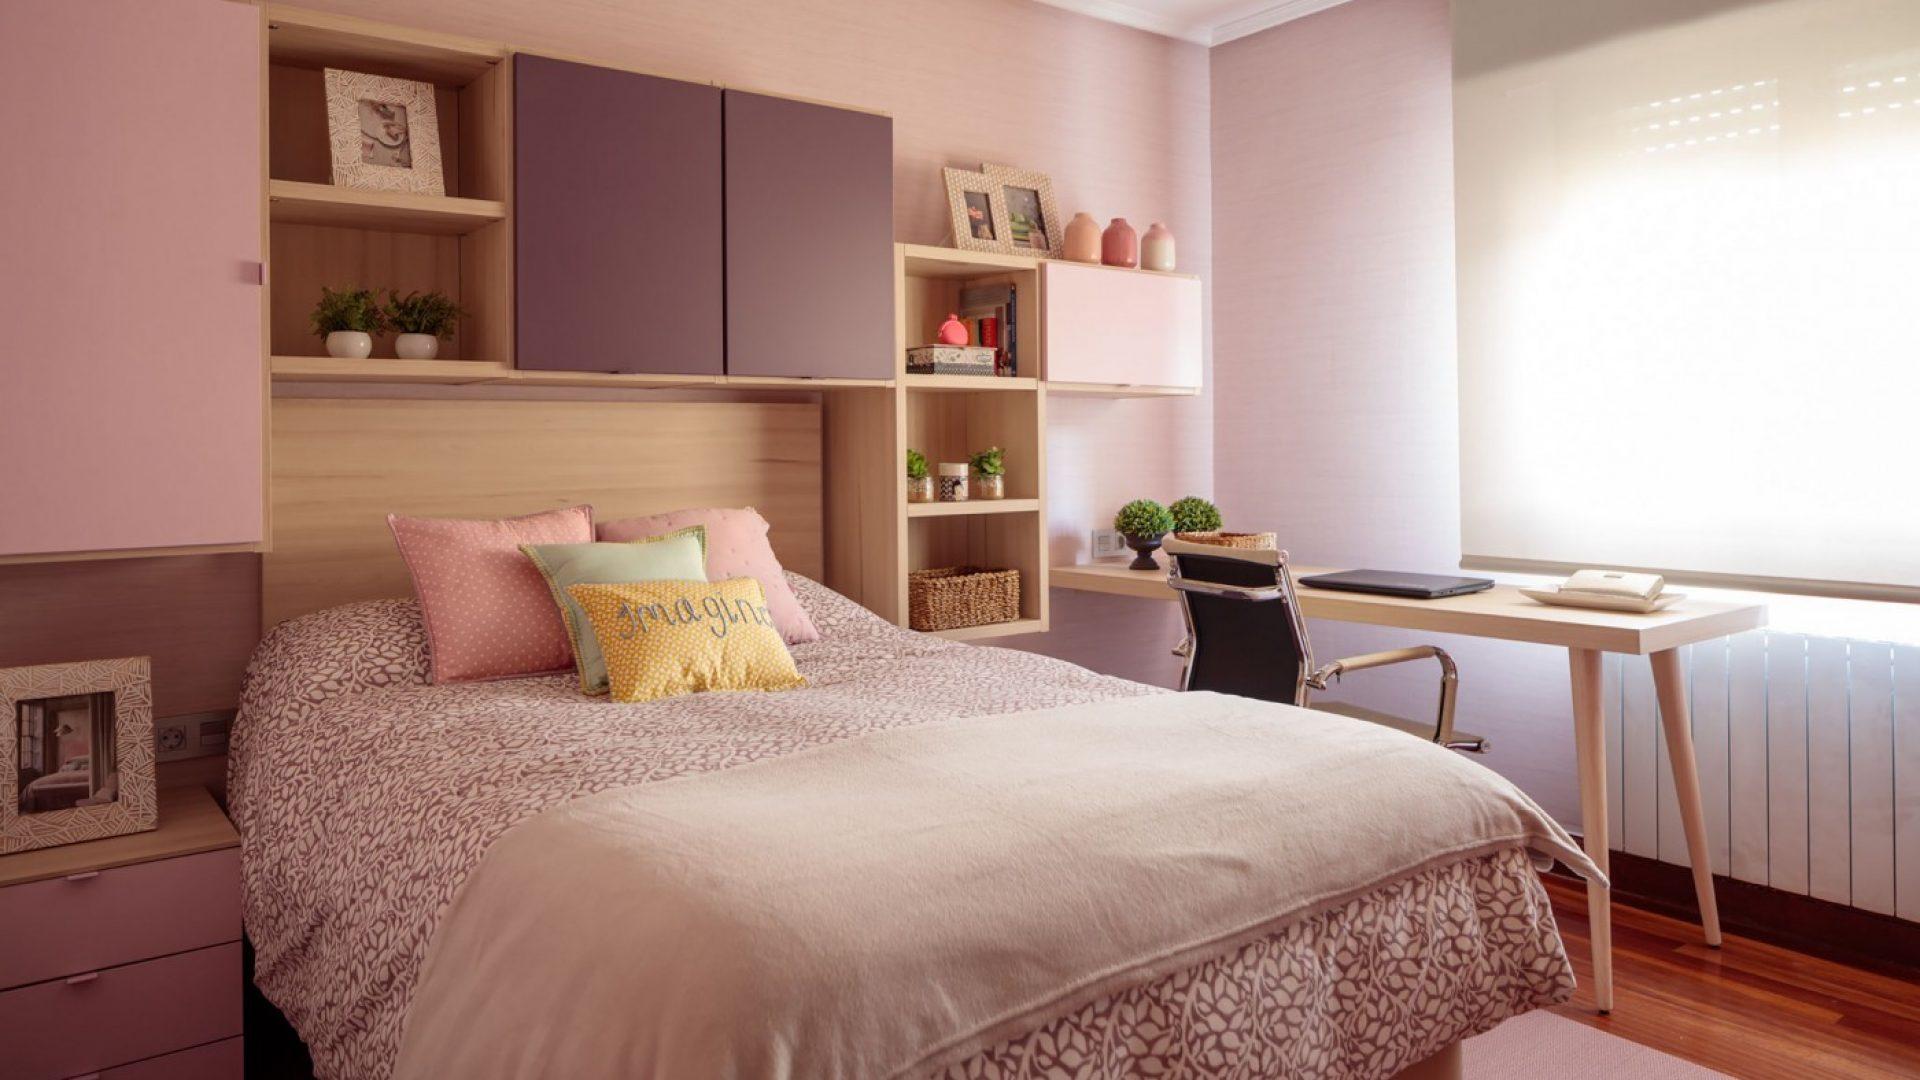 mugarri-decoracion-habitacion-juvenil-rosa-violeta 01